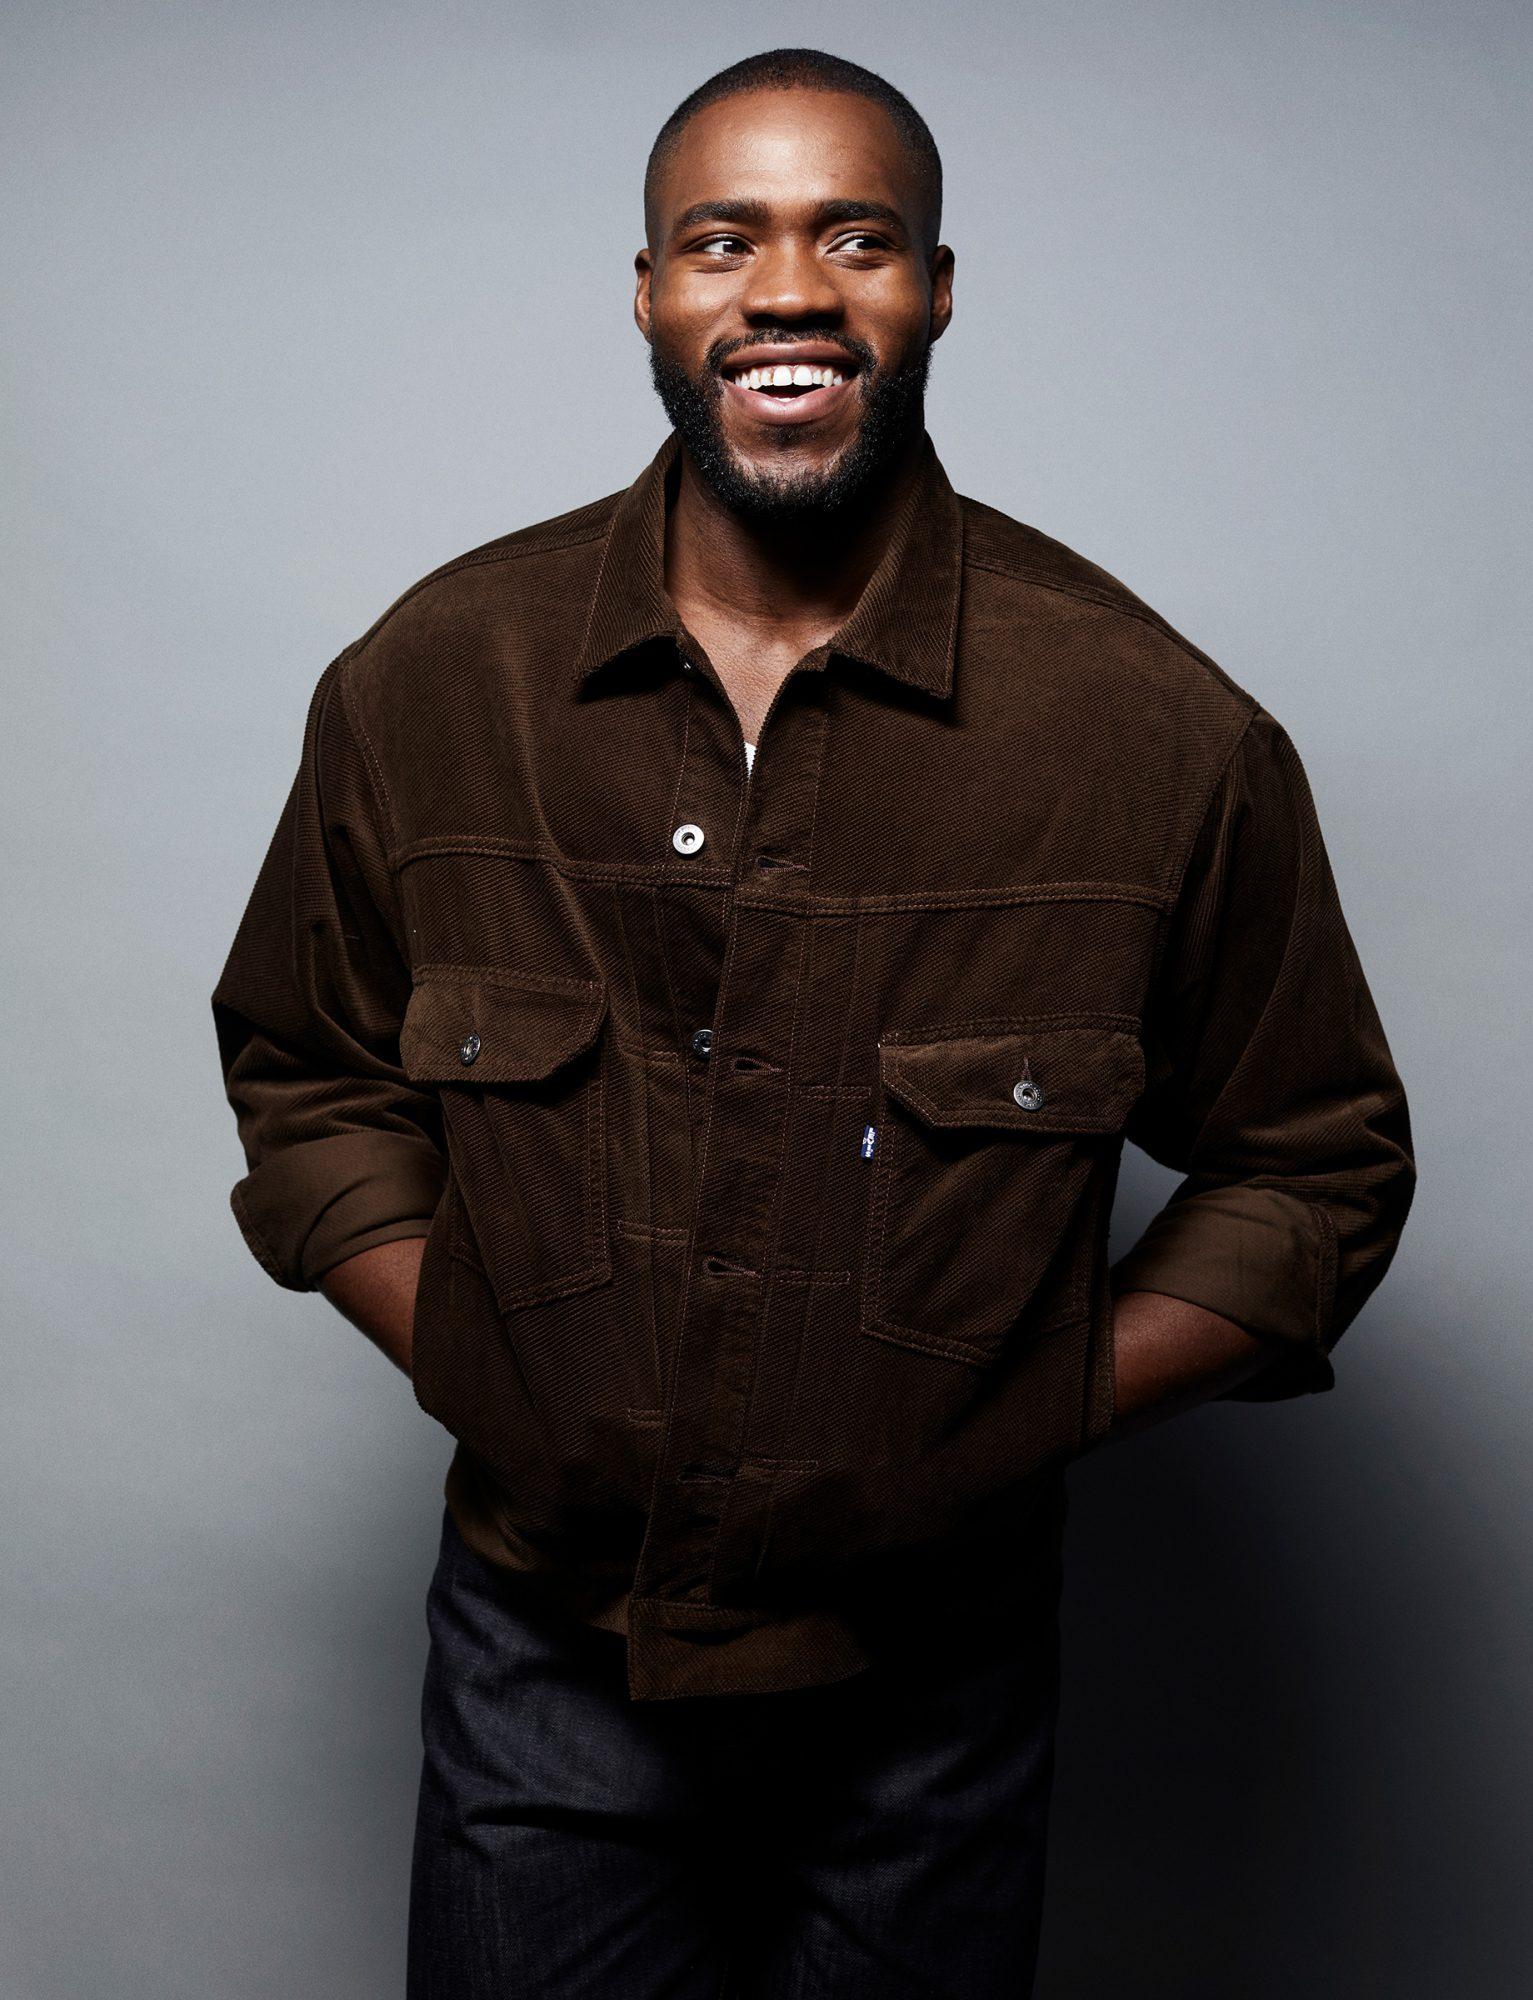 Martins Imhangbe Nigerian Actor